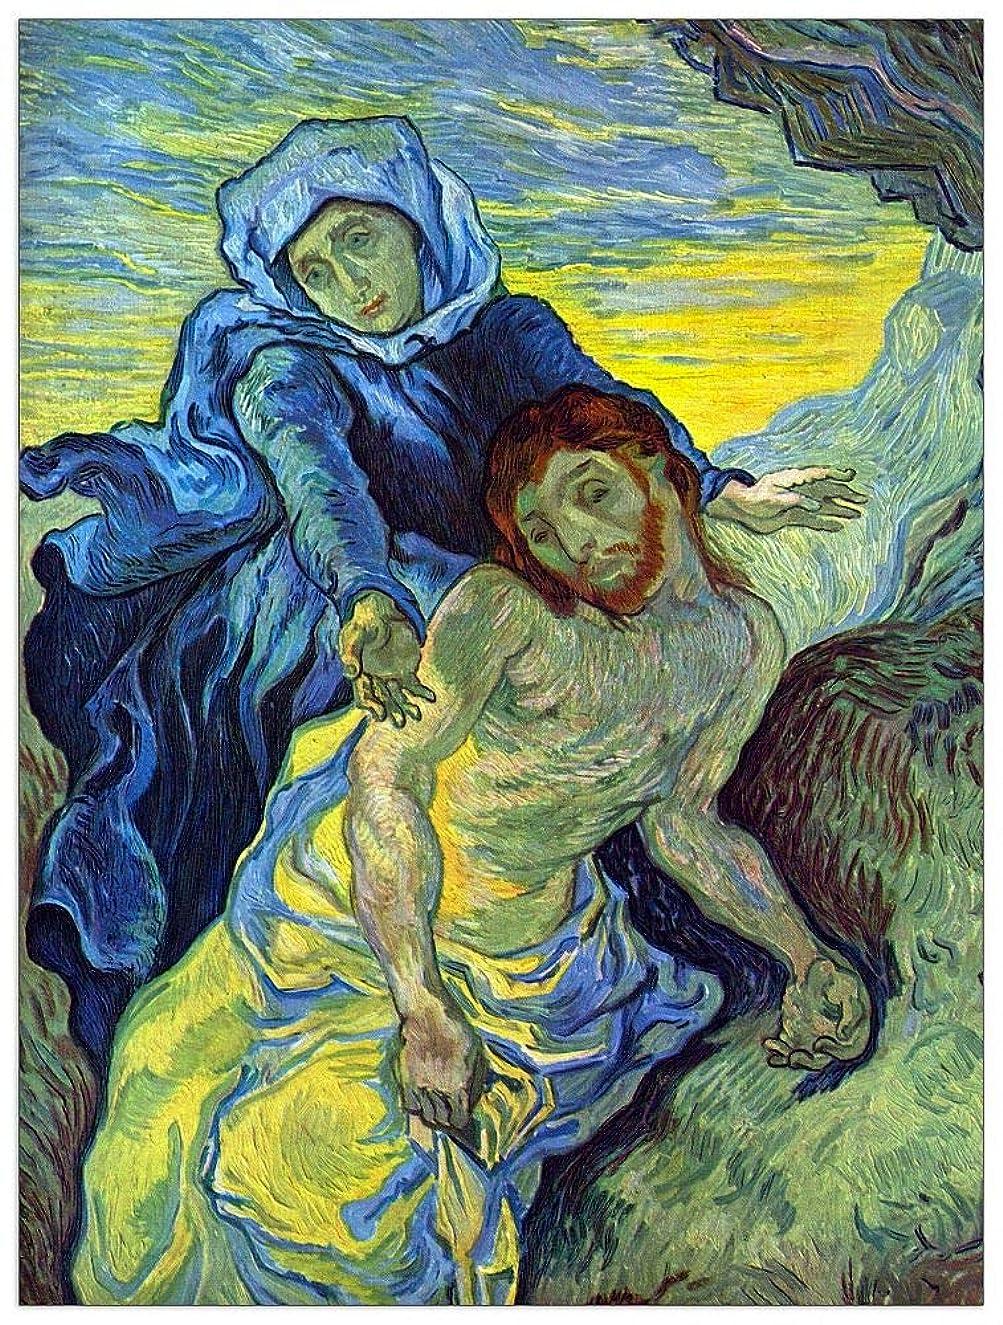 ArtPlaza TW90792 Van Gogh Vincent - Pieta (by Eugene Delacroix) Decorative Panel 27.5x35.5 Inch Multicolored